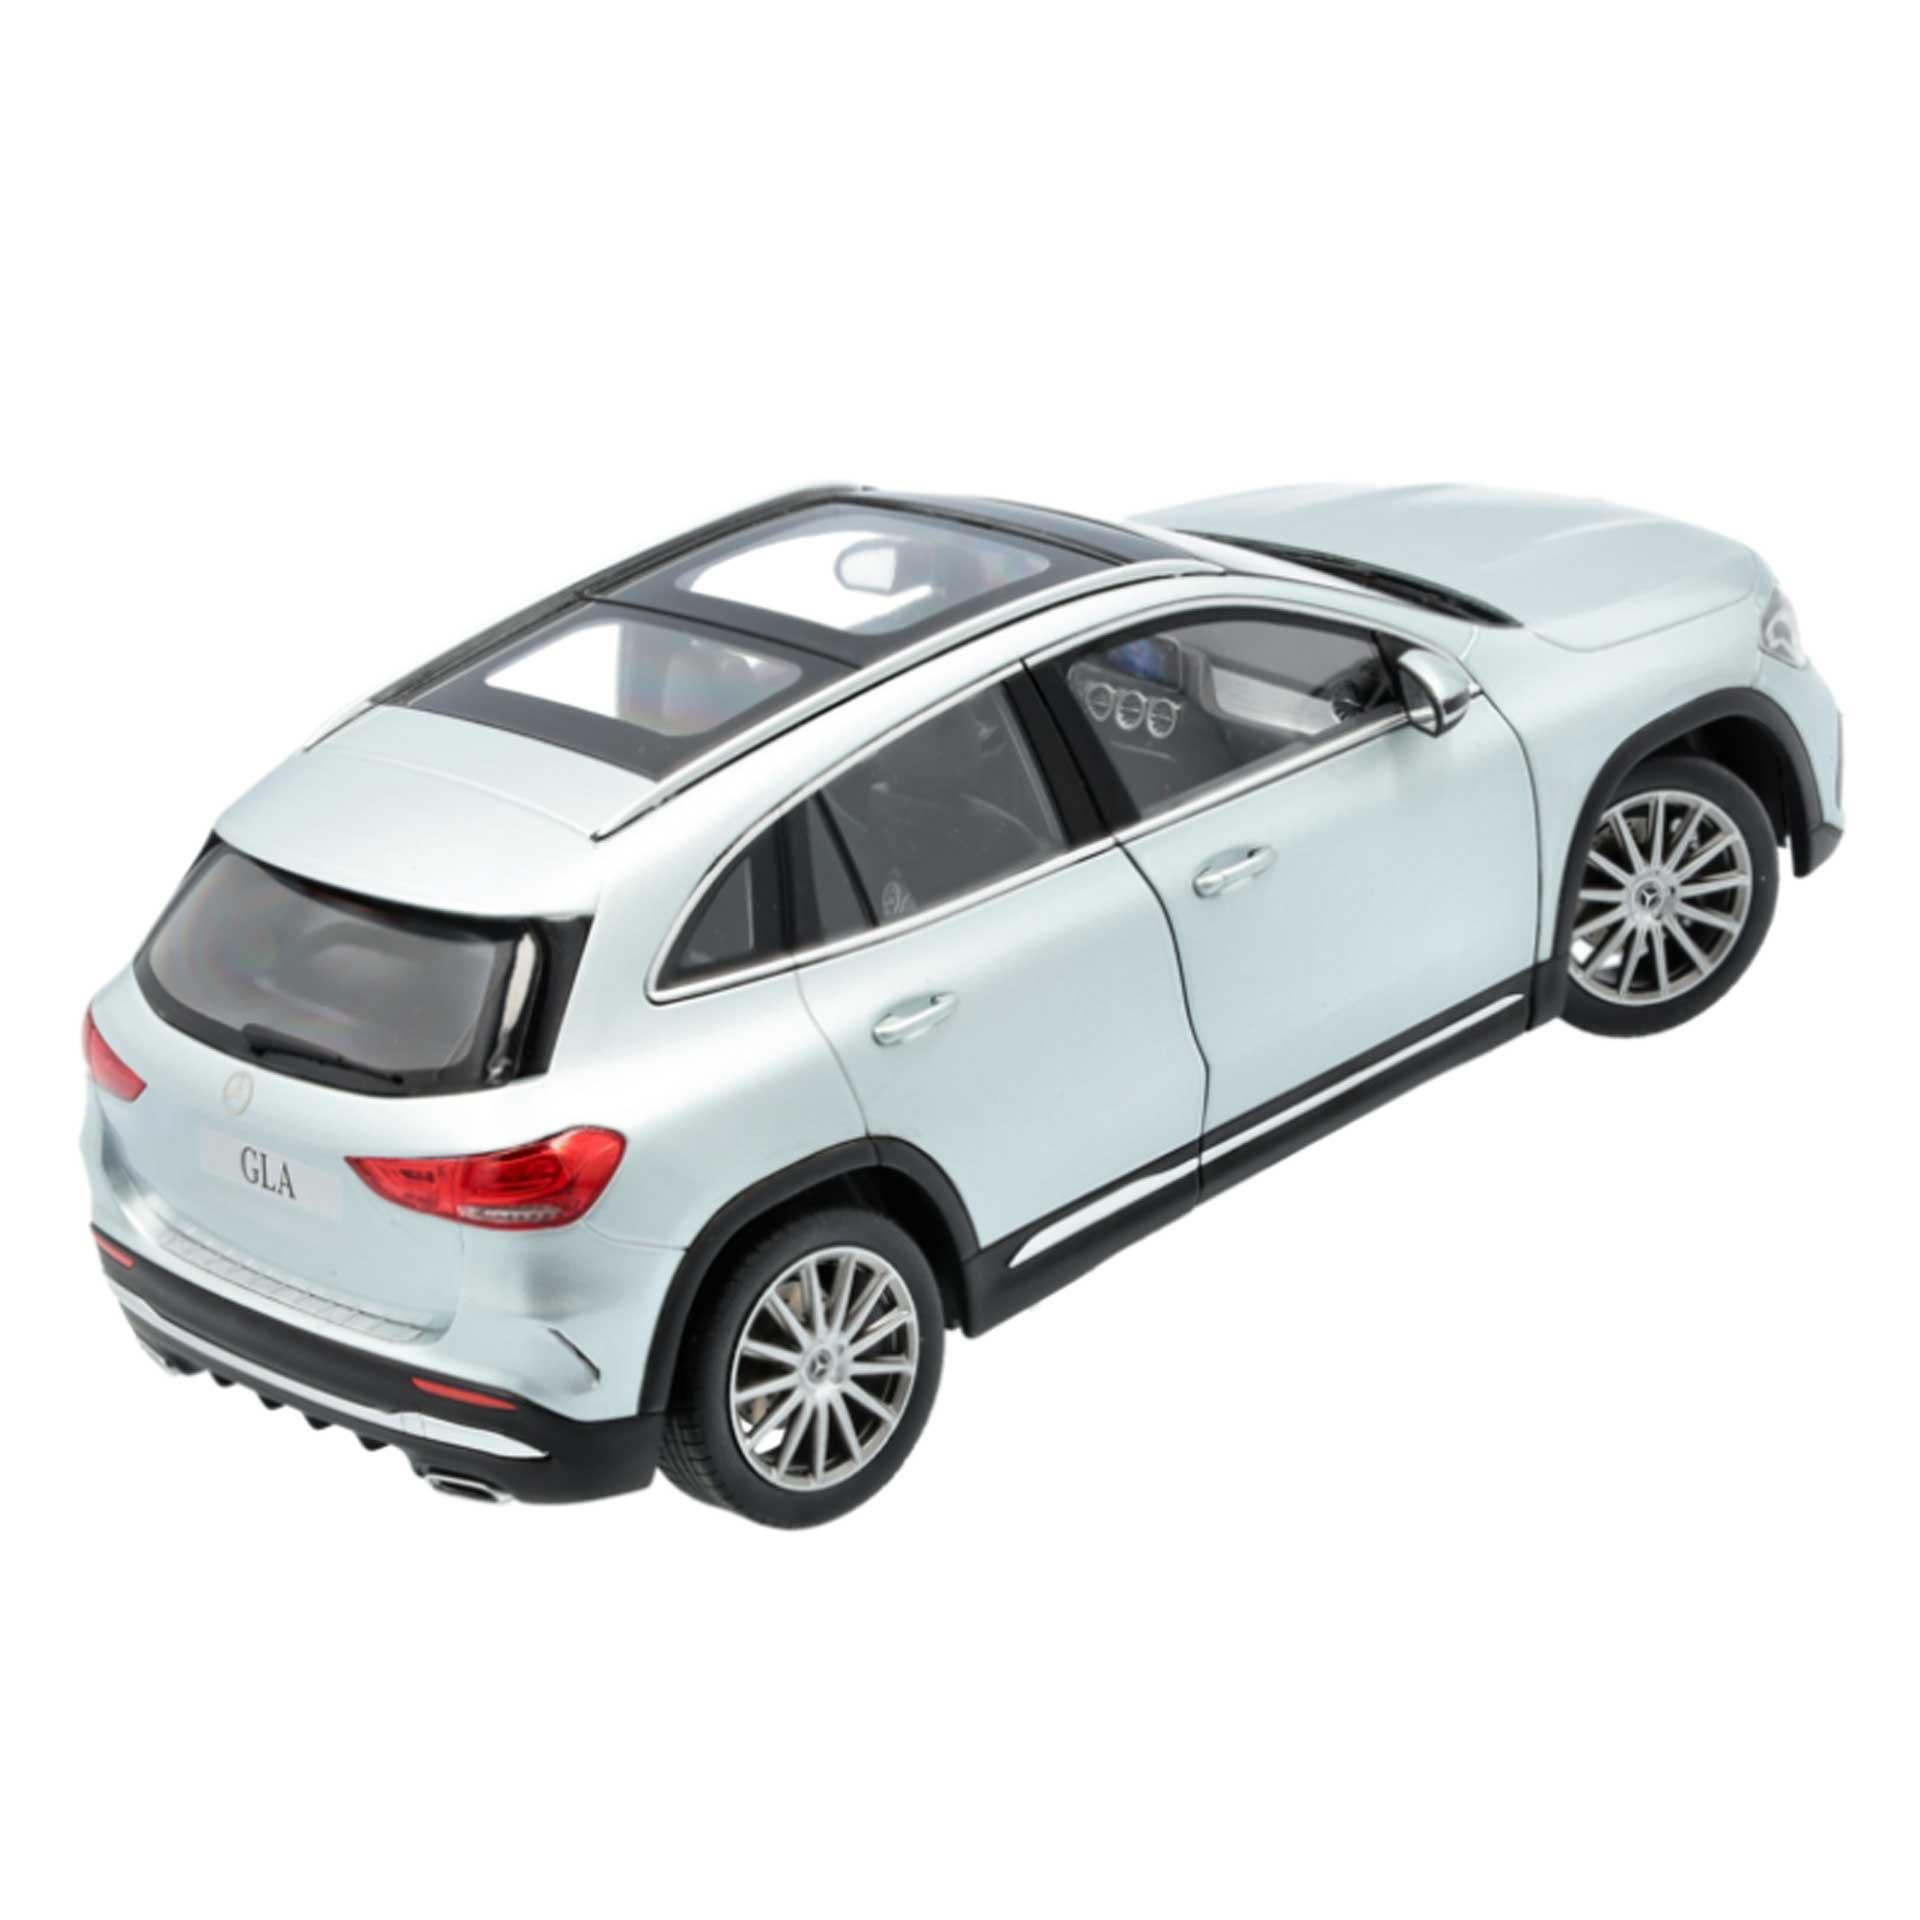 Mercedes-Benz GLA Modellauto H247 1:18 iridiumsilber